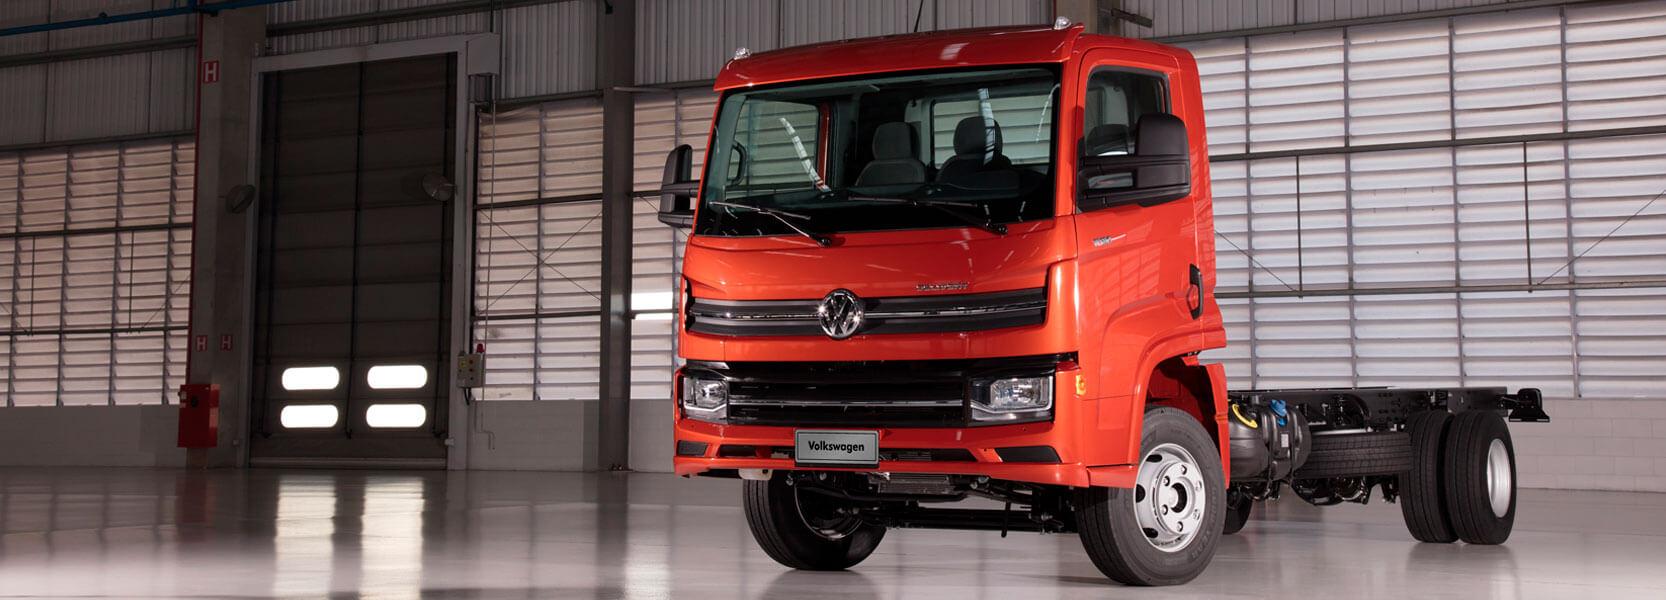 Camiones Delivery